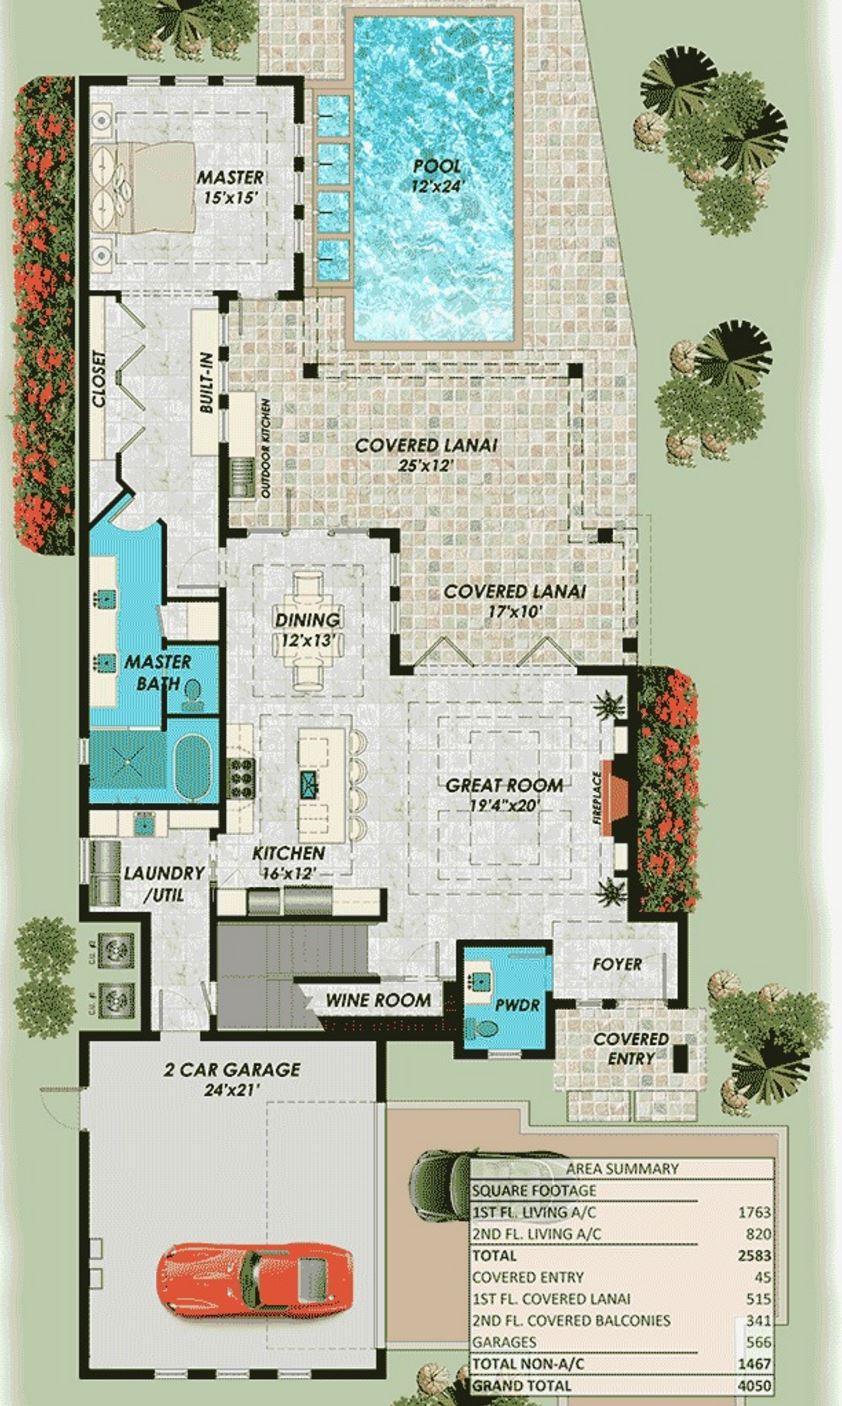 Plano de casa moderna de dos pisos planos de casas modernas for Casa moderna y lujosa